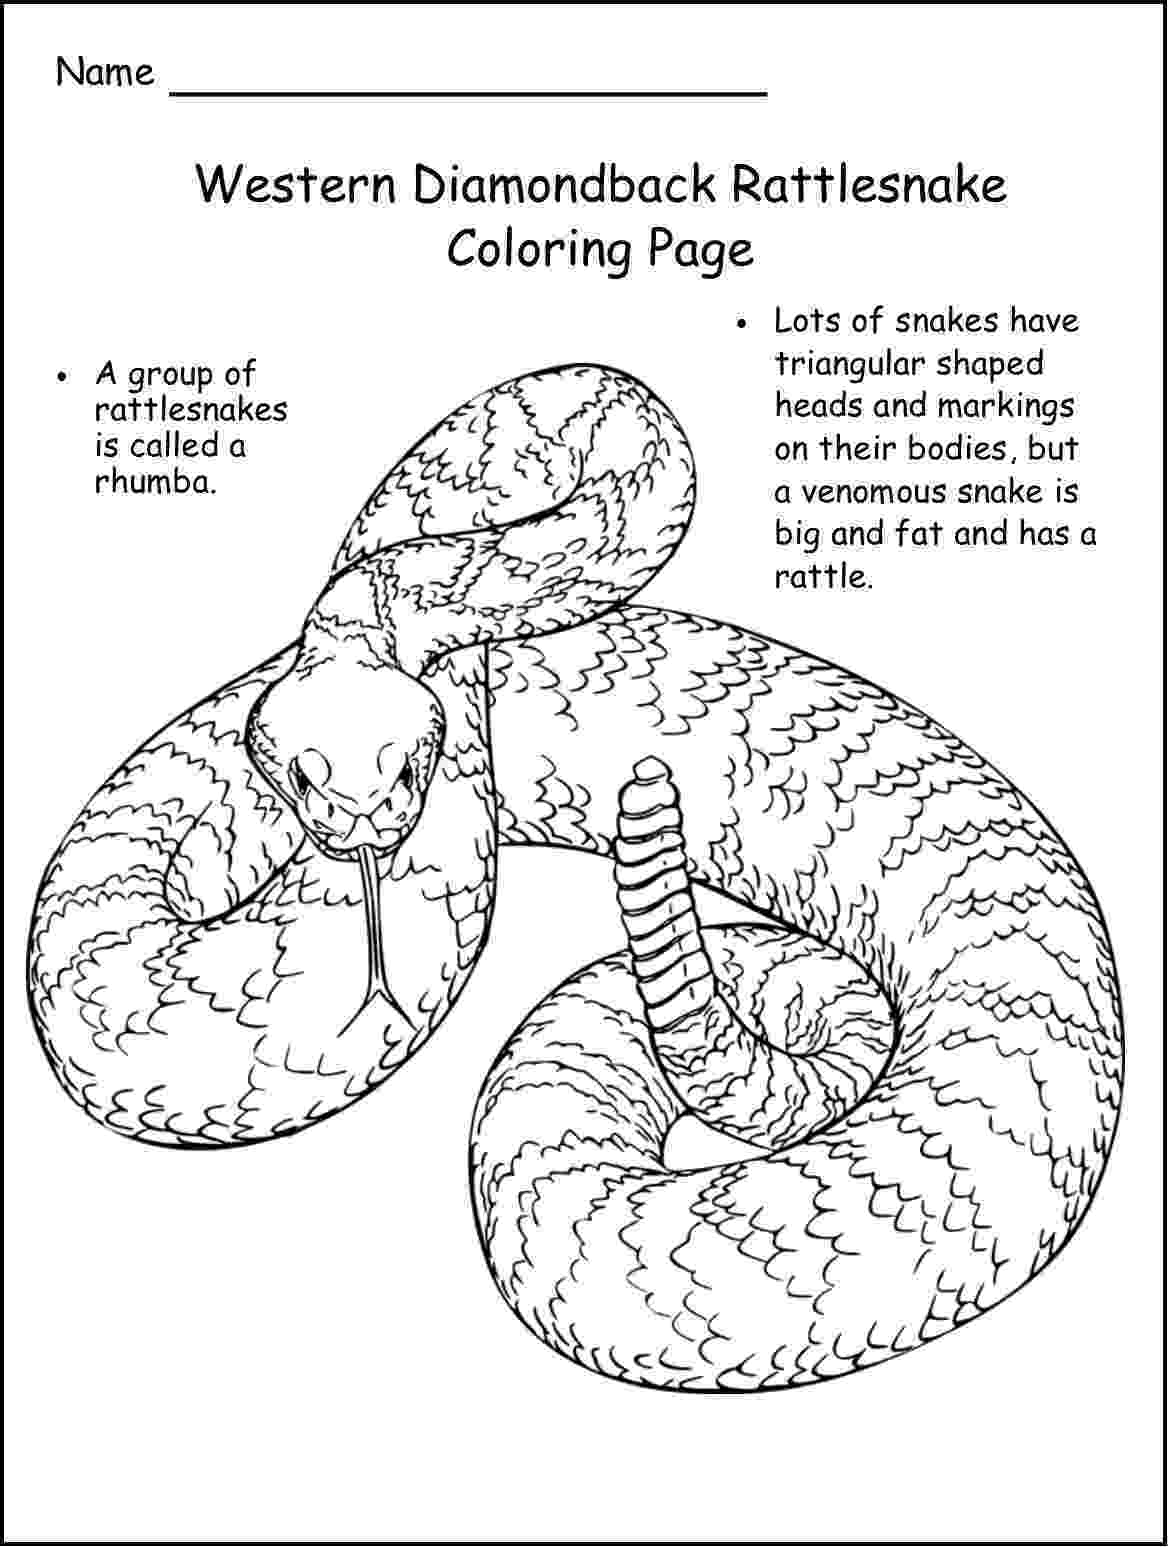 western diamondback rattlesnake coloring pages rattlesnakes coloring pages download and print for free pages diamondback coloring western rattlesnake